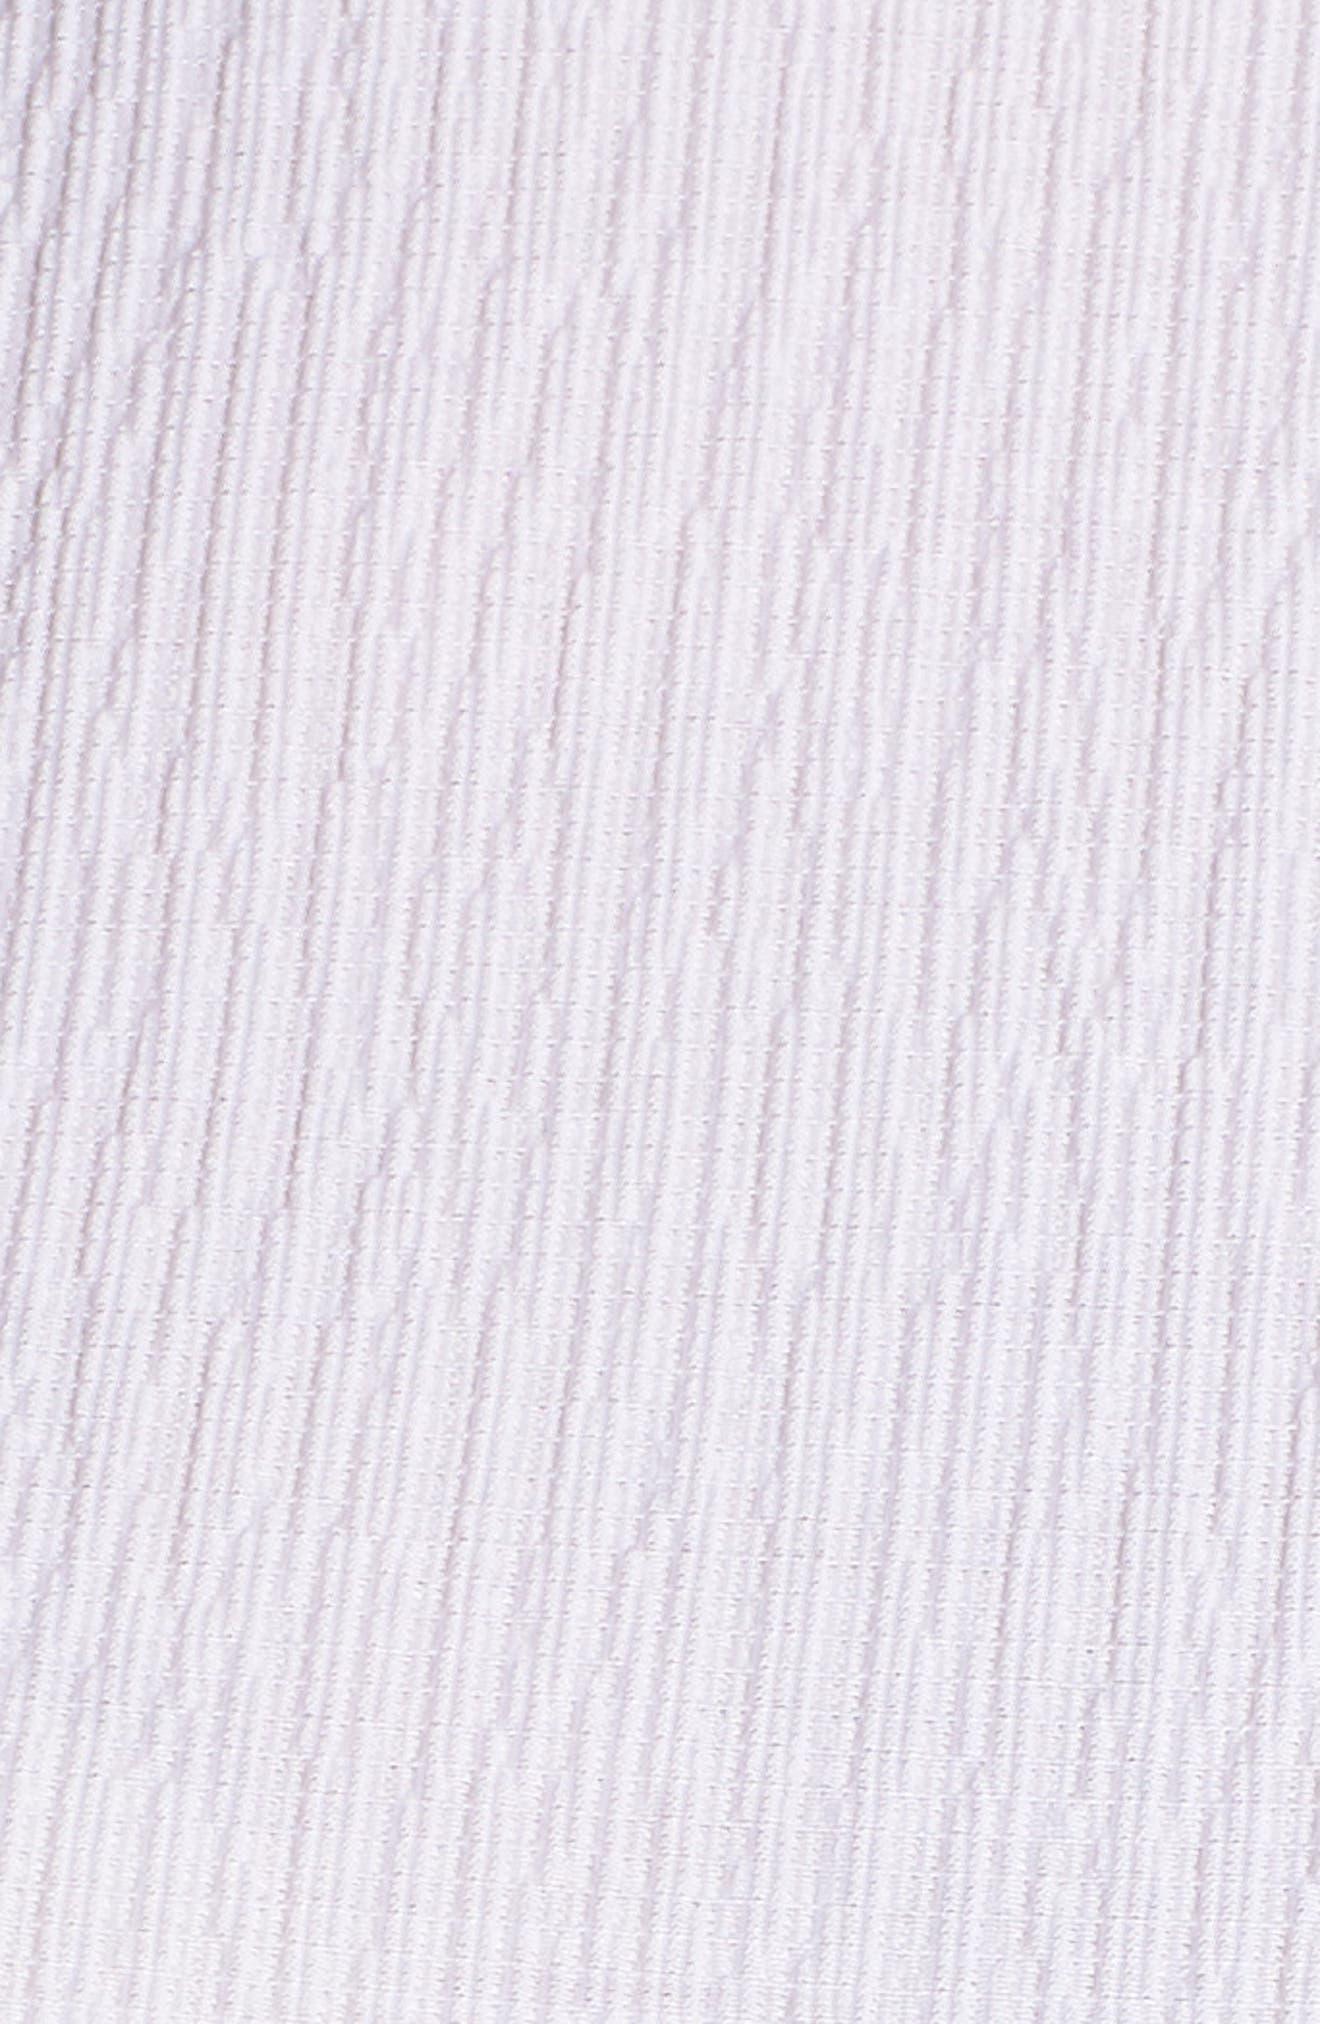 Ruffle Dress,                             Alternate thumbnail 6, color,                             100